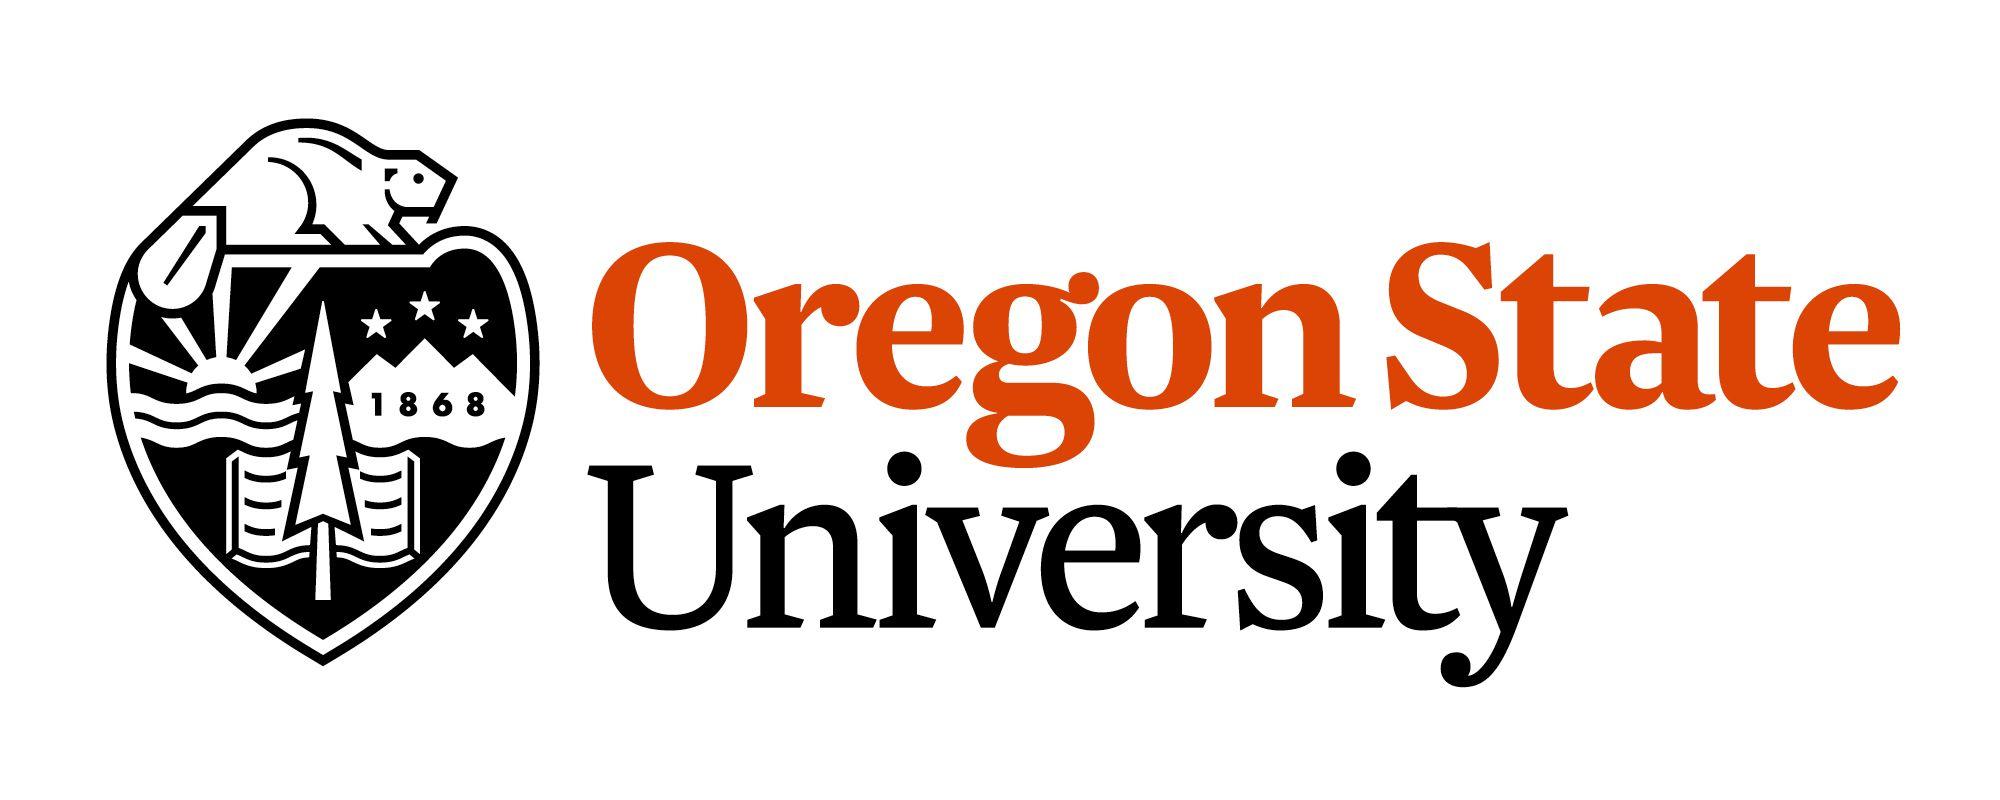 Edu Guest Post on Oregon State University - Oregonstate.edu DA87